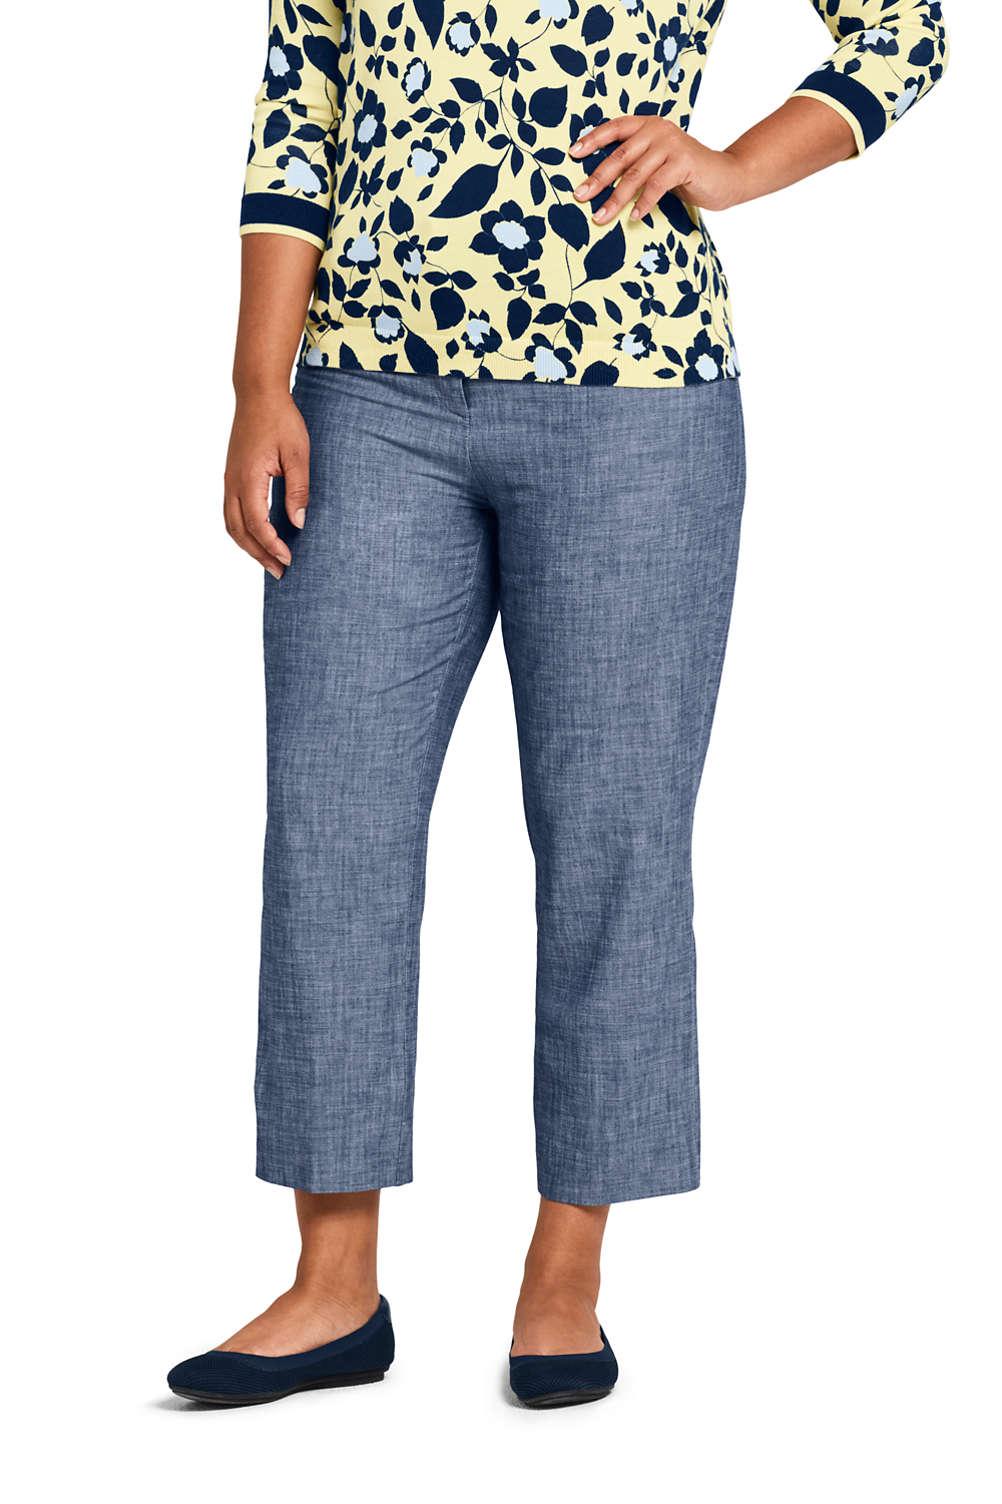 86c72c3c9f2 Women s Plus Size Mid Rise Chambray Capri Pants from Lands  End